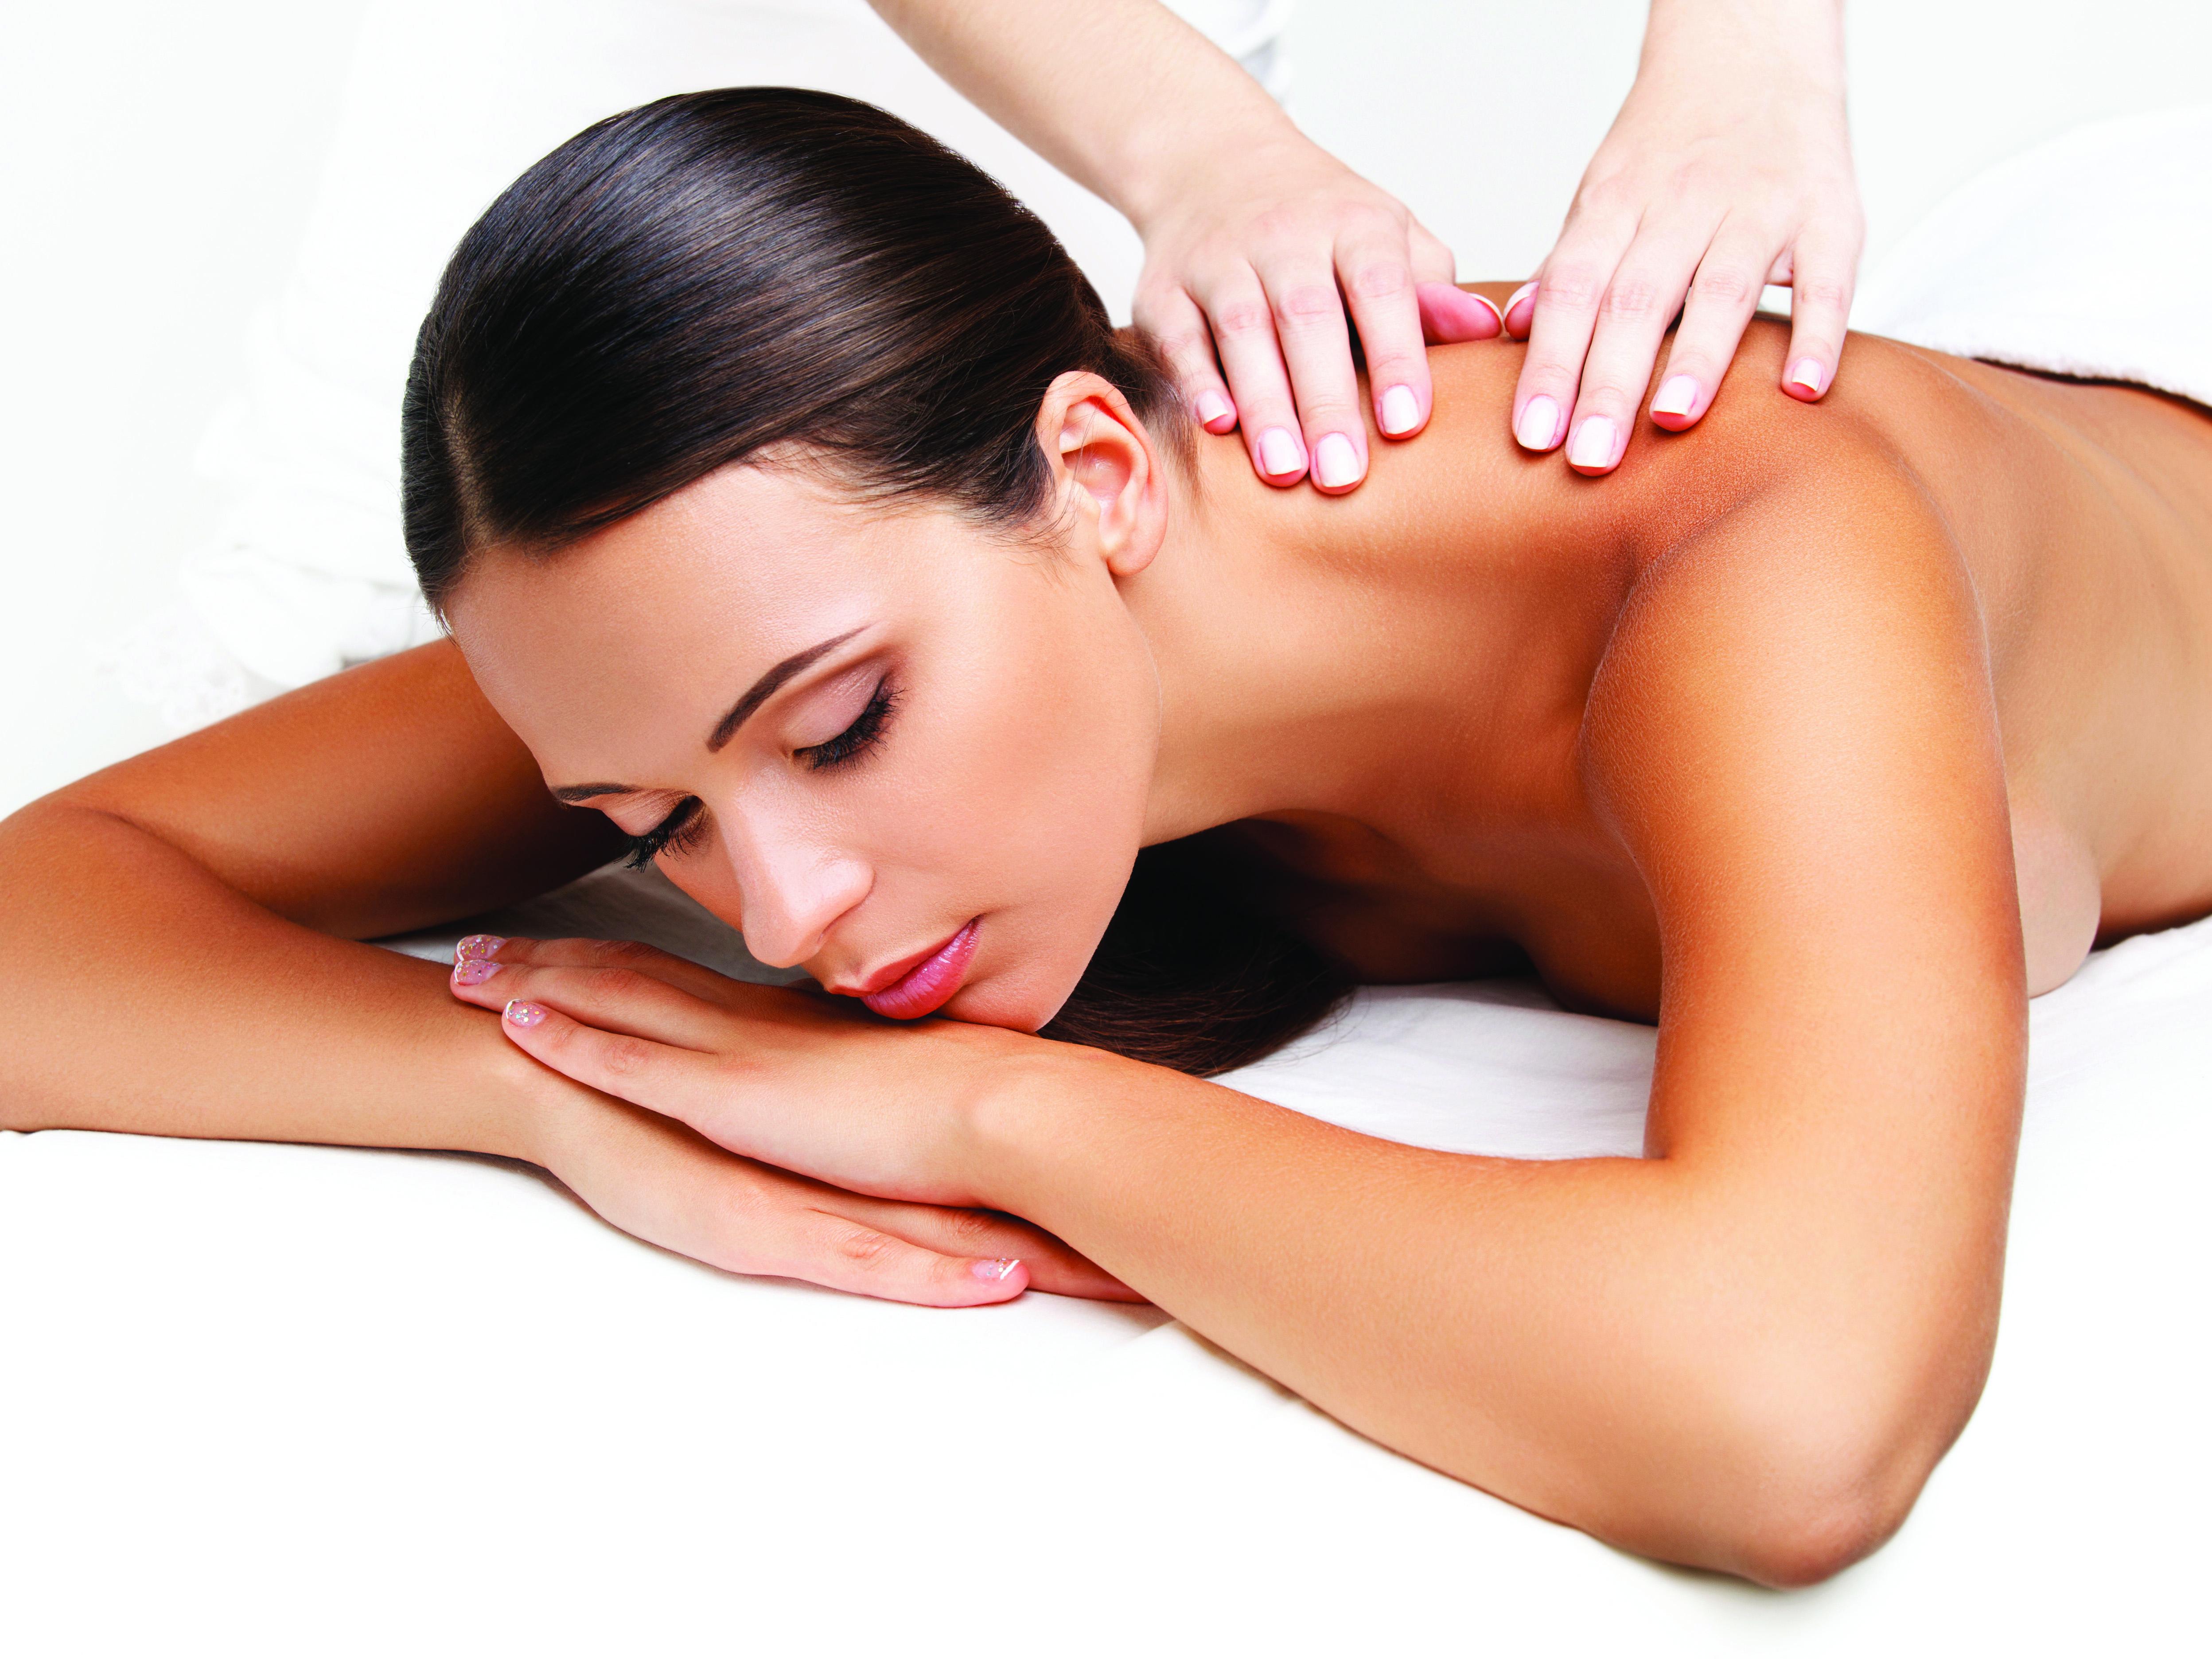 Woman having massage on beauty table